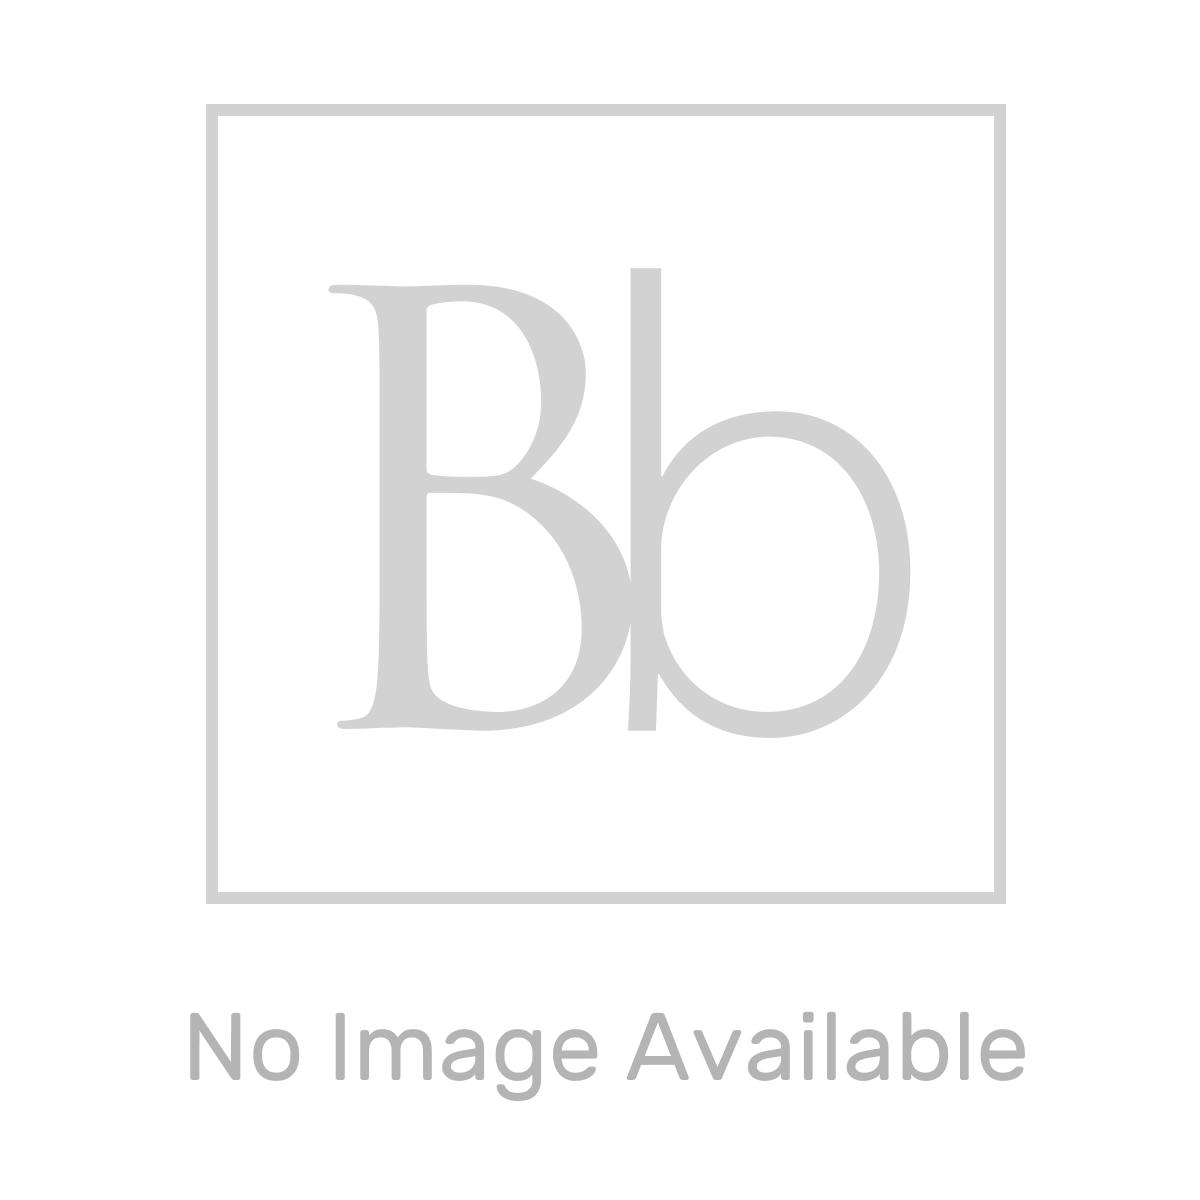 Aquadart Black Slate Shower Tray 1600 x 700 Dimension